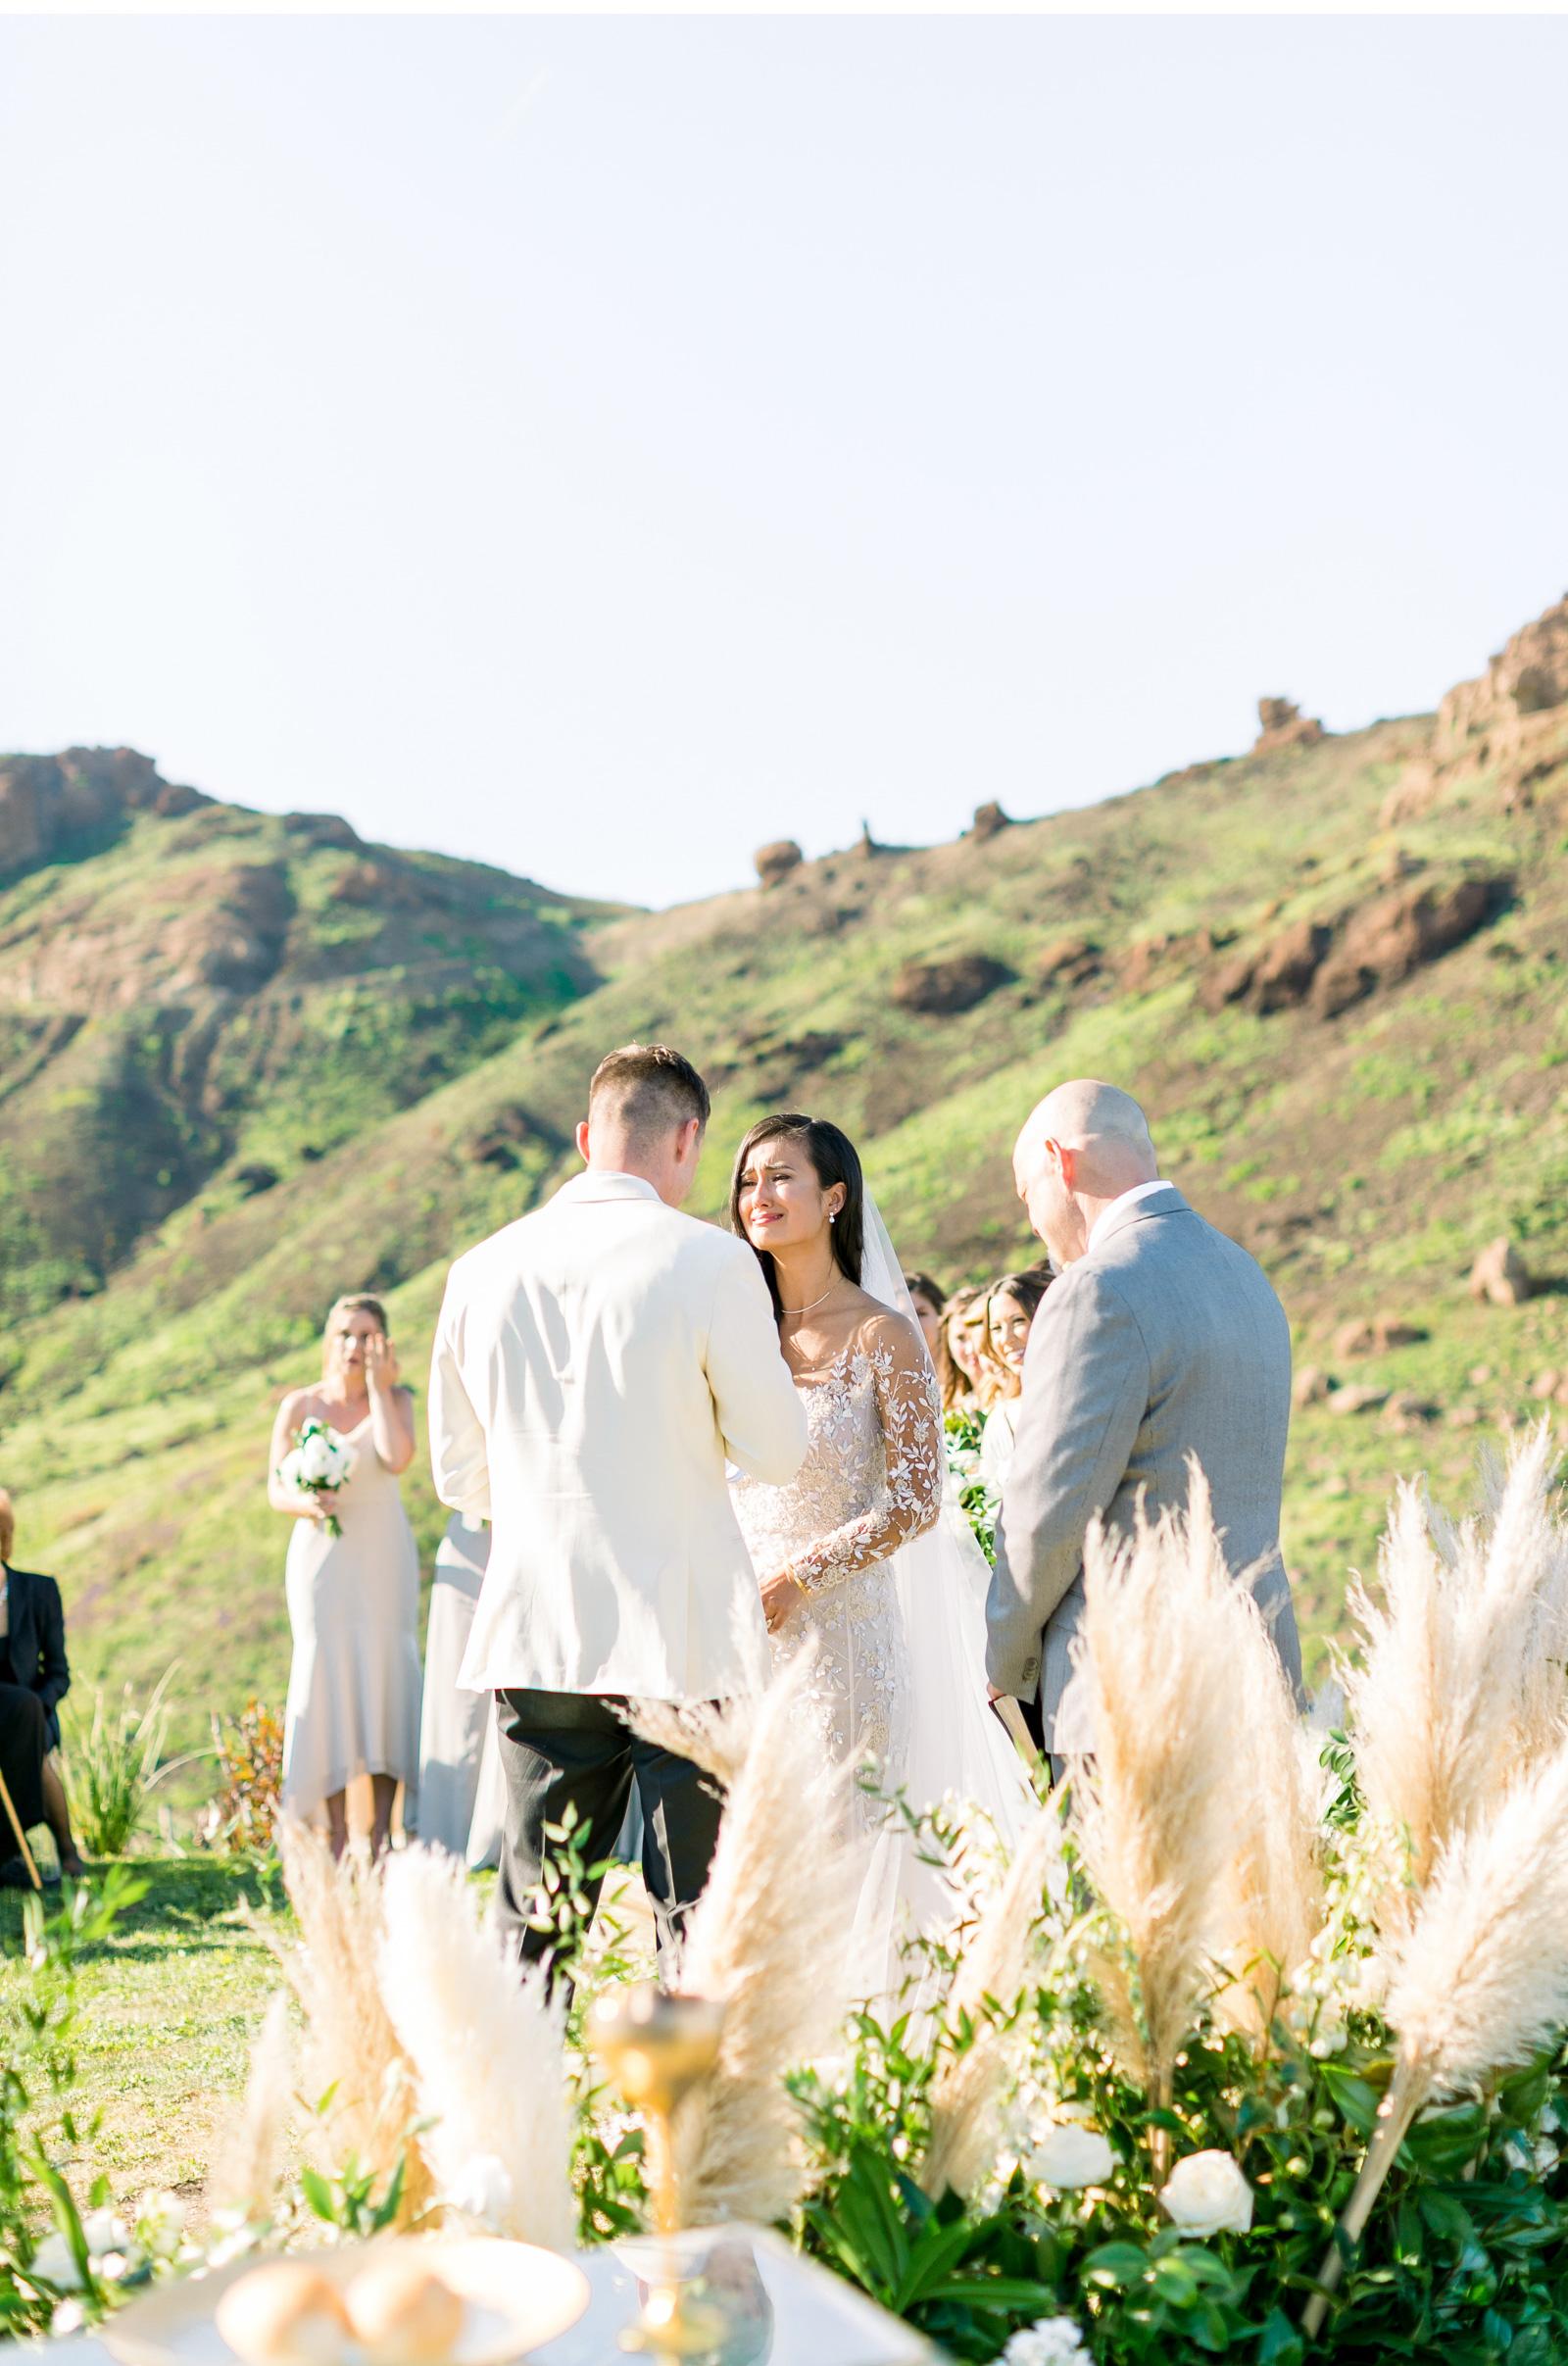 Southern-California-Wedding-Photographer-West-Coast-Weddings-Style-Me-Pretty-Malibu-Wedding-Photographer-Natalie-Schutt-Photography_05.jpg